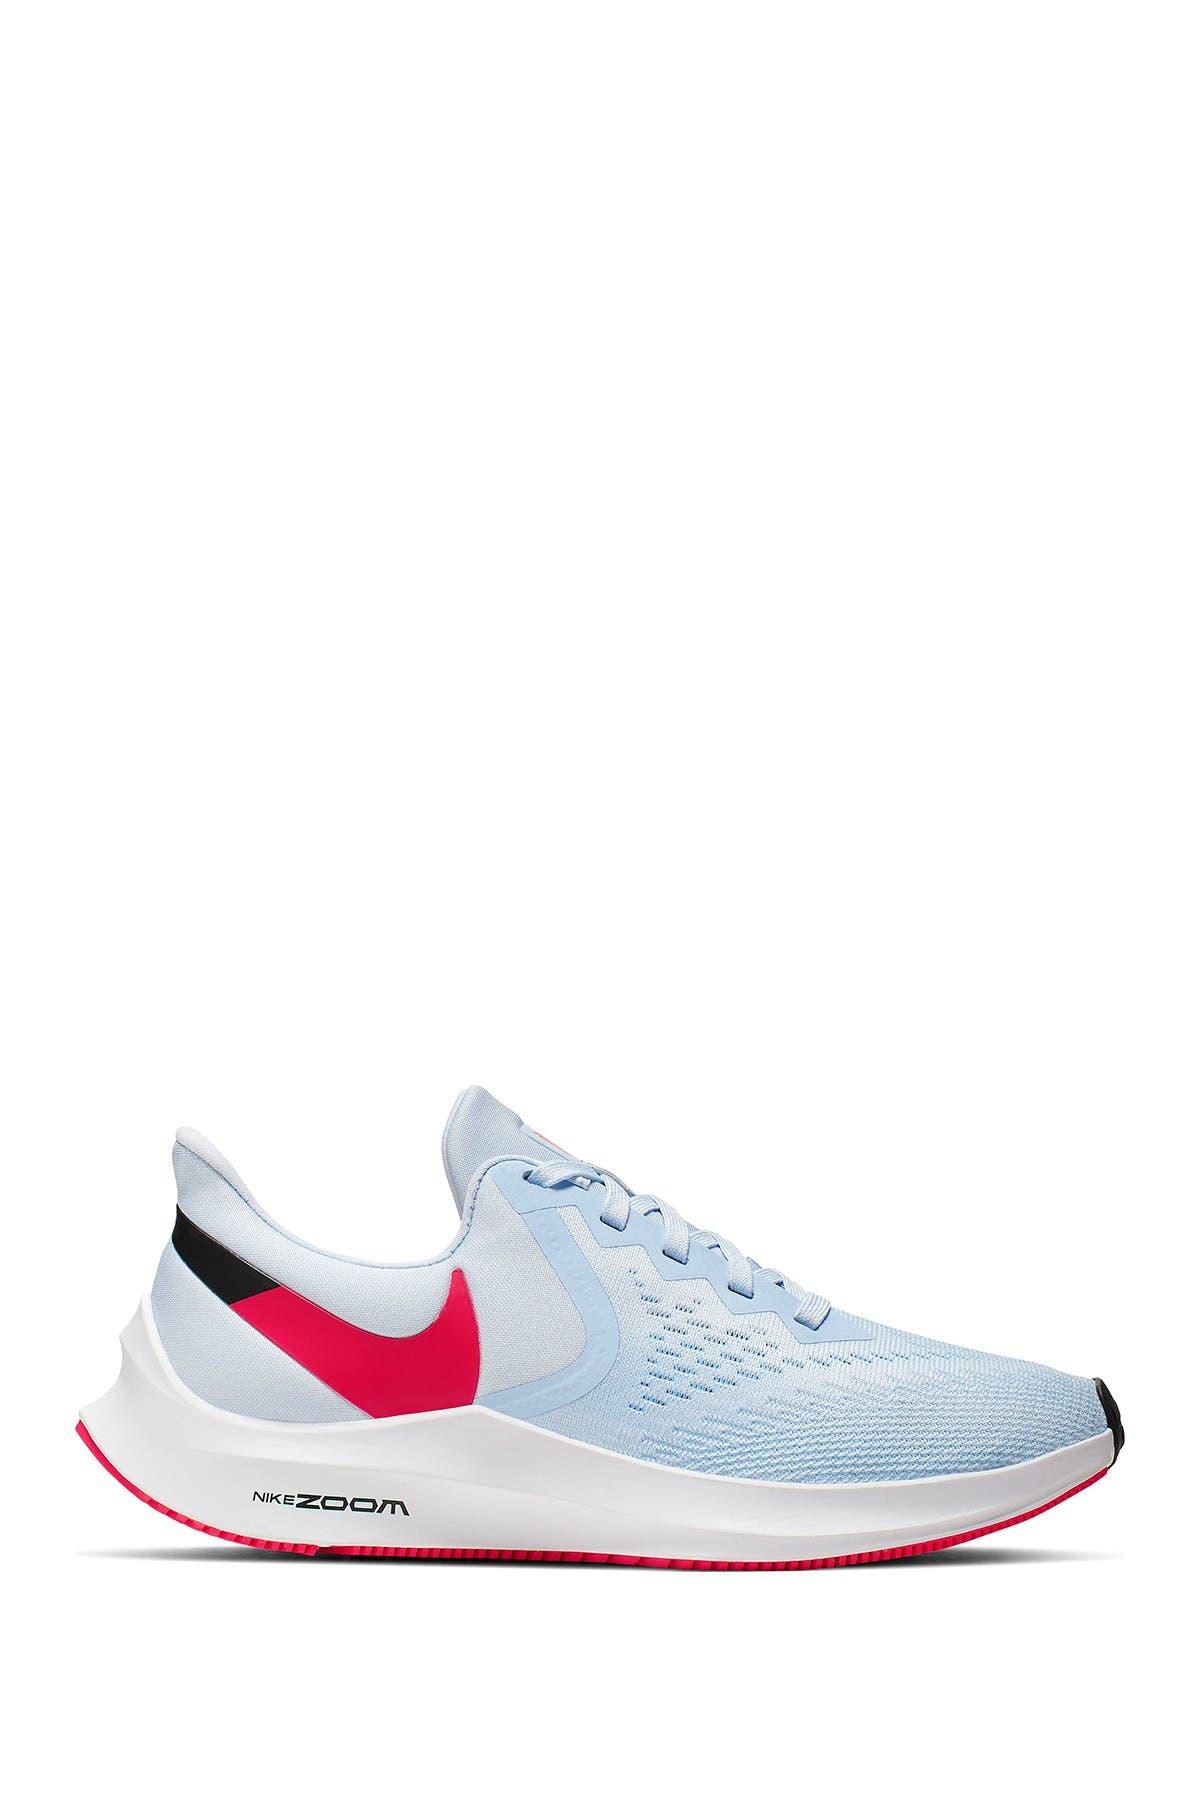 Image of Nike Zoom Winflo 6 Sneaker